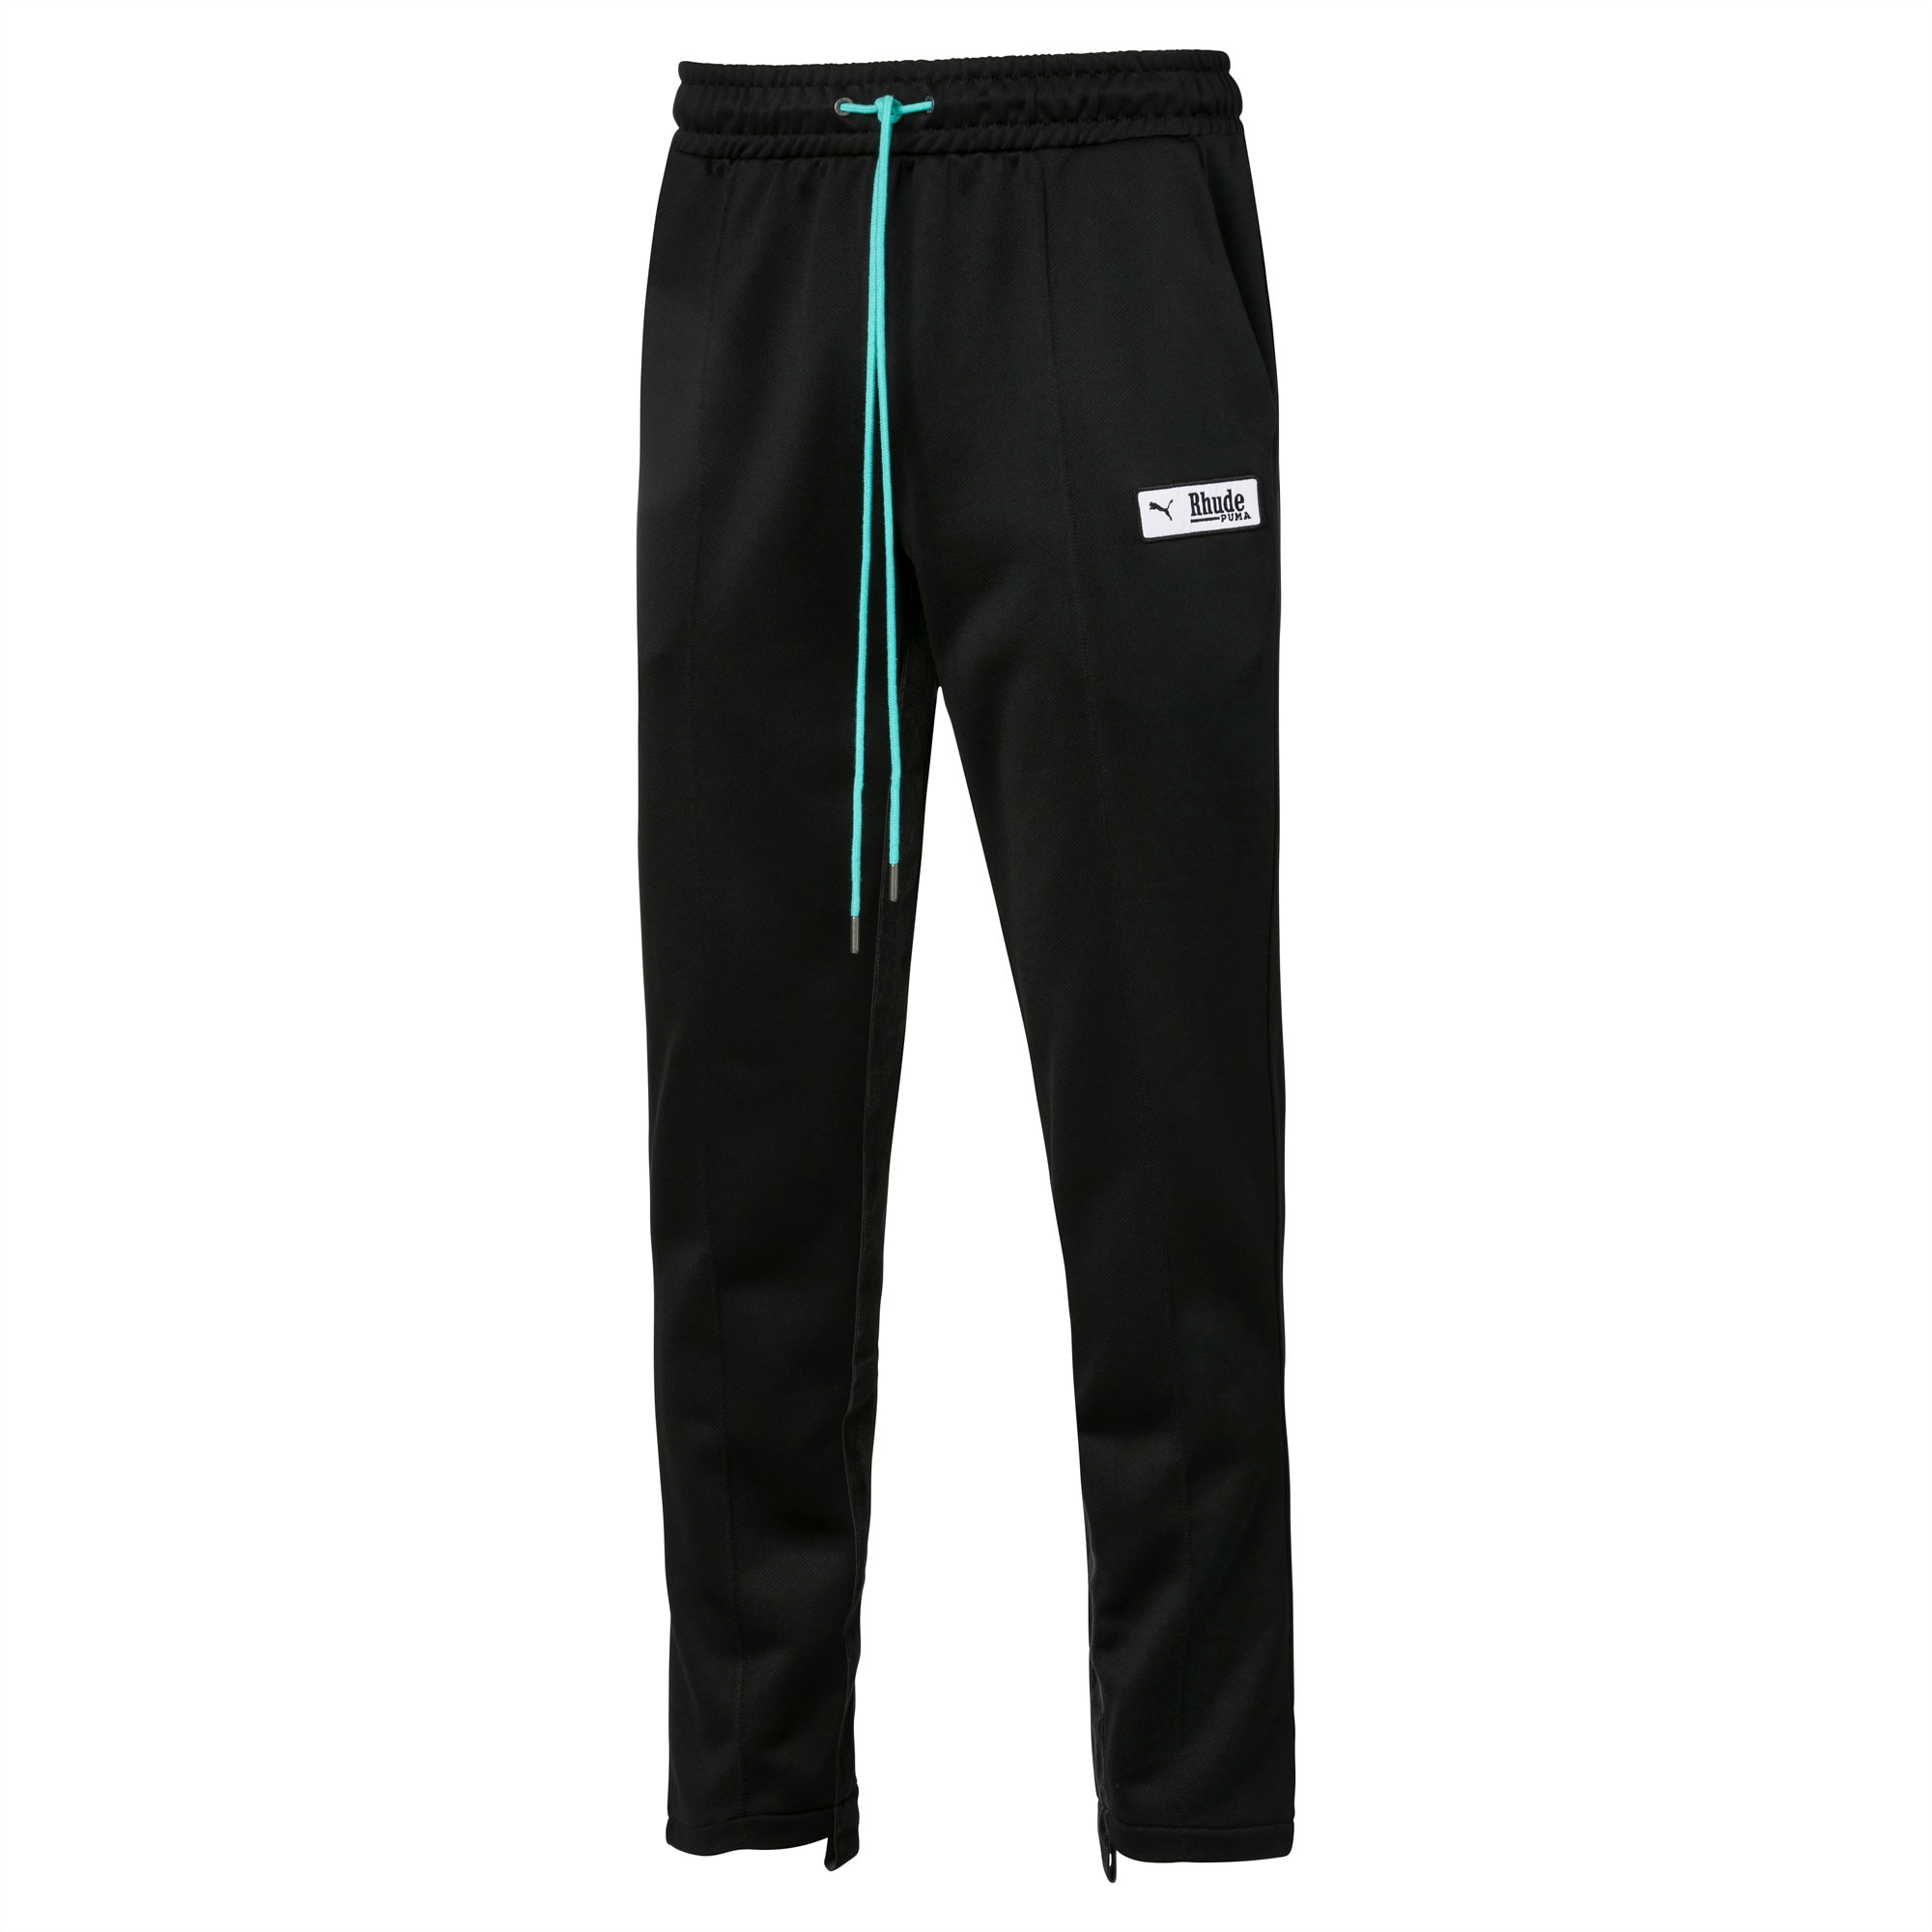 Pantaloni sportivi in maglia PUMA x RHUDE uomo